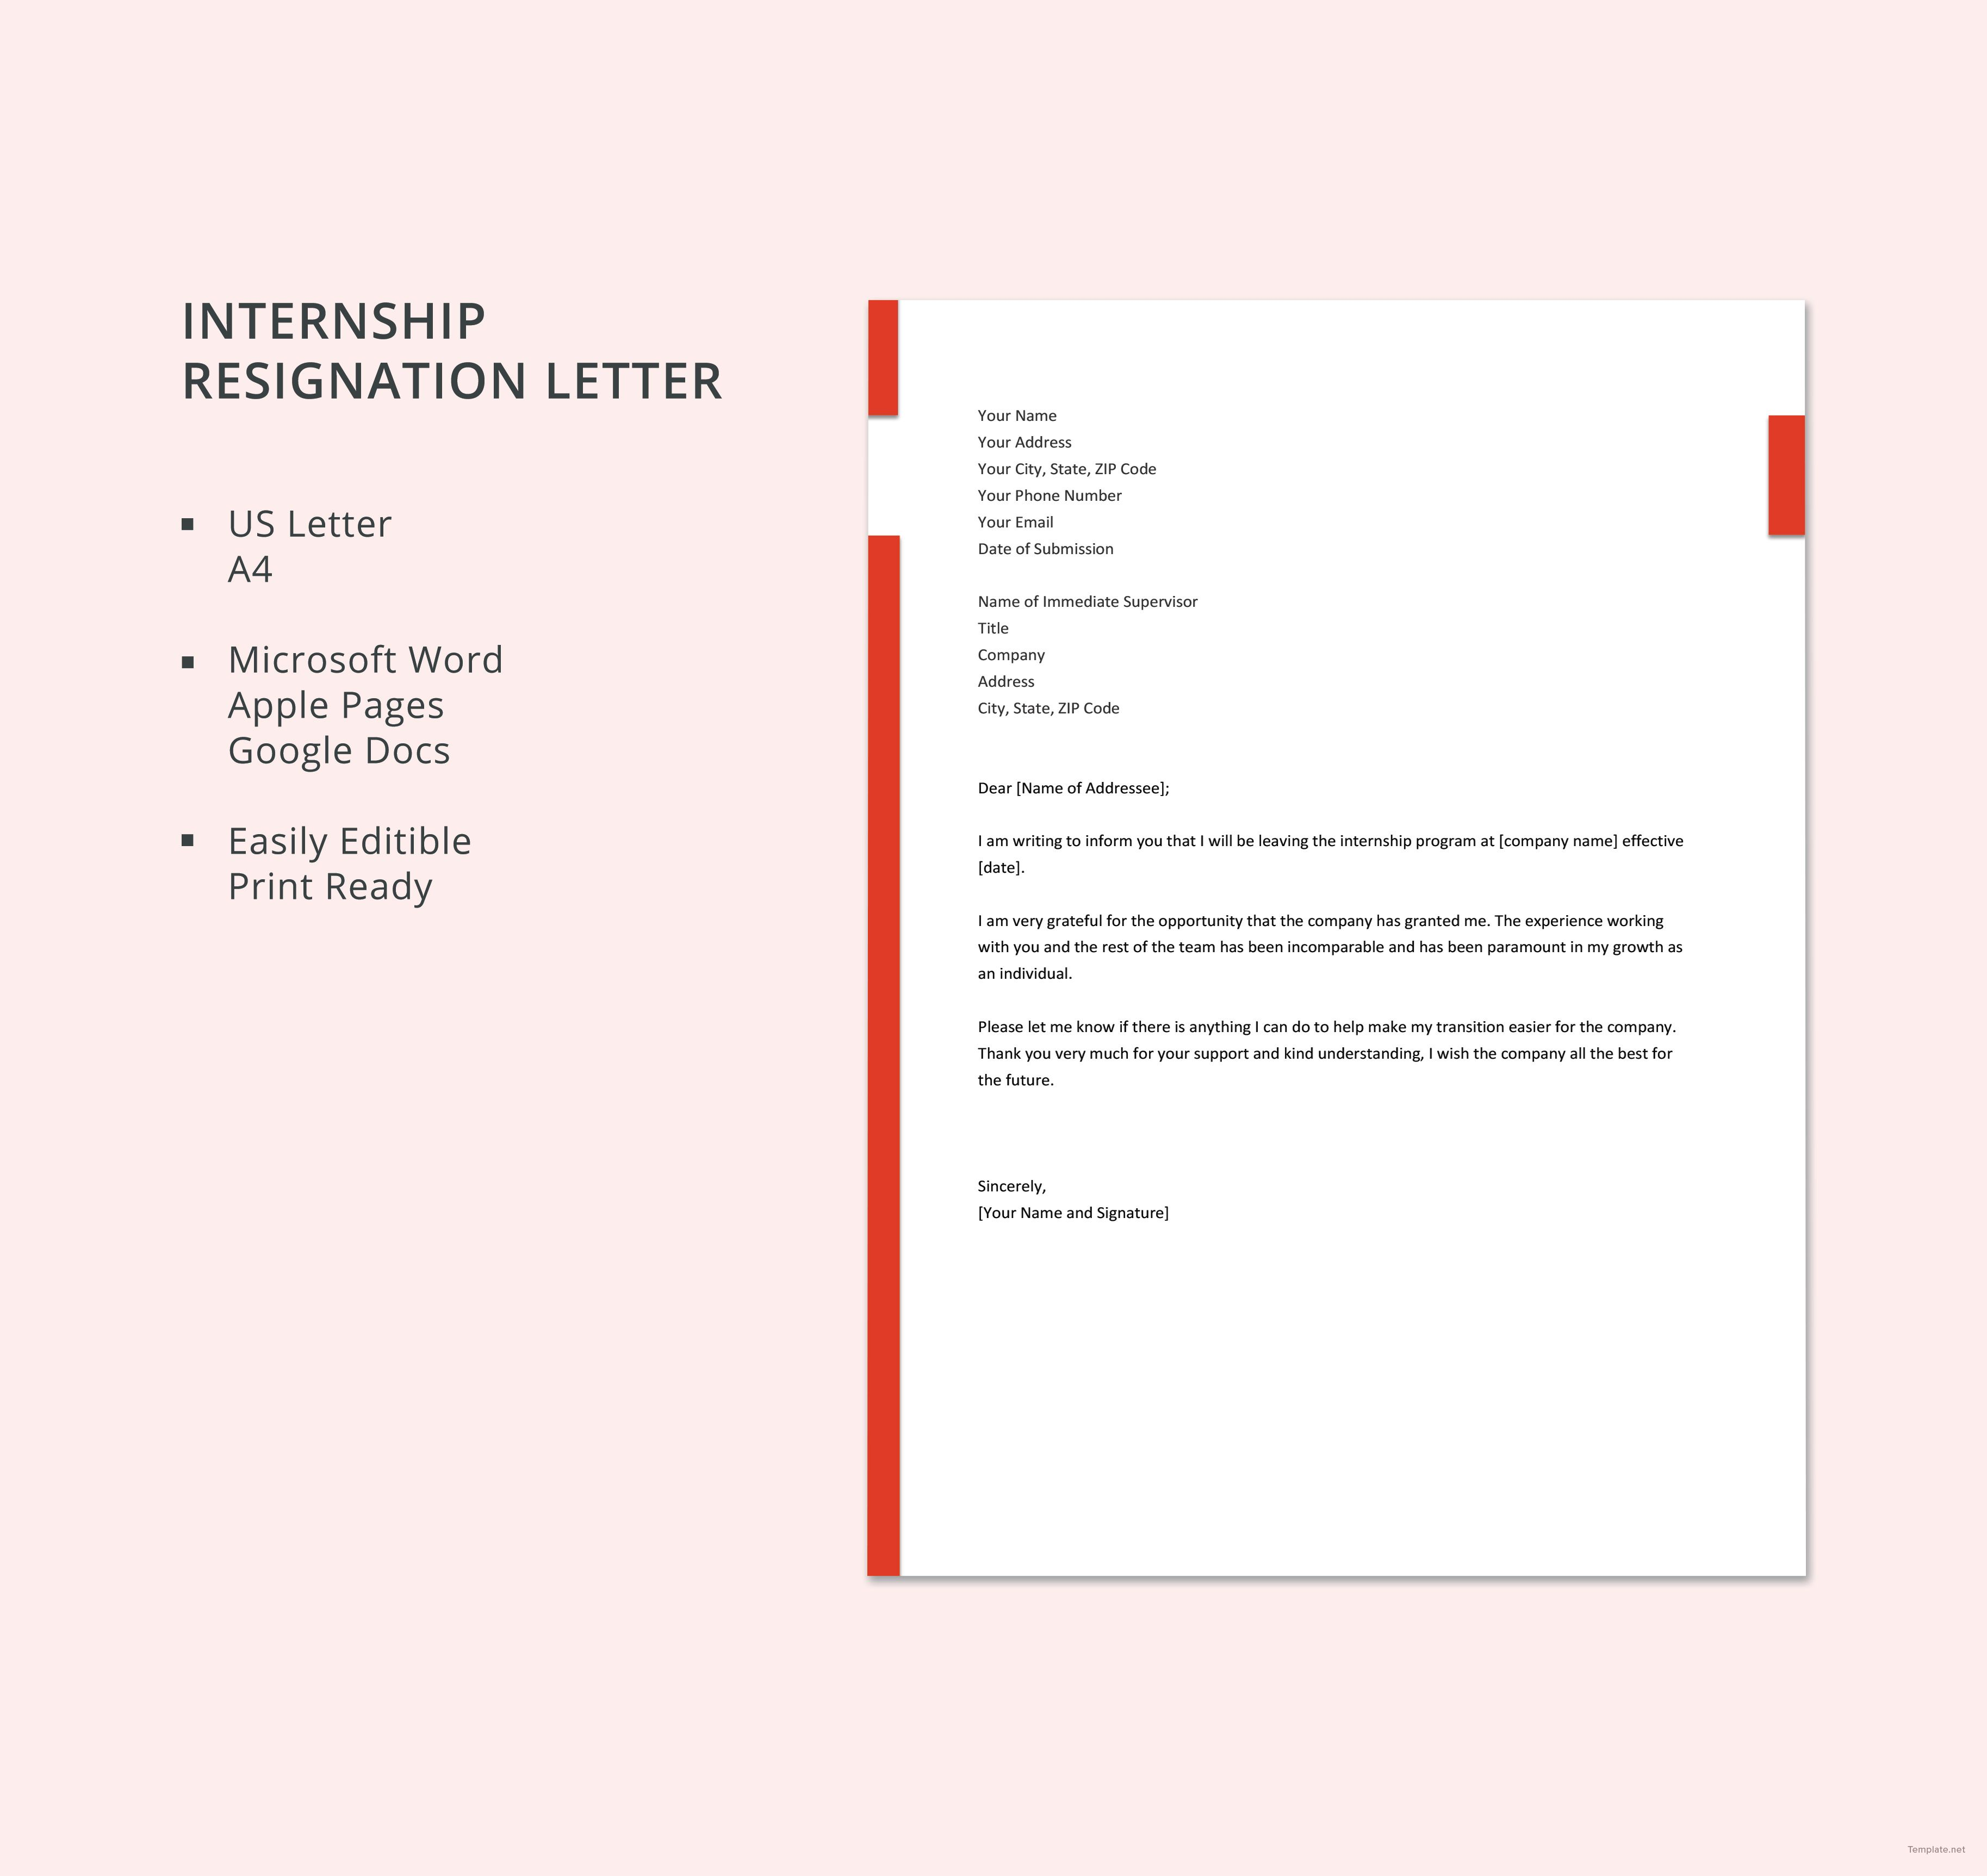 Internship Resignation Letter Template Free Pdf Google Docs Word Apple Pages Template Net Resignation Letter Letter Templates Lettering Microsoft word resignation letter template